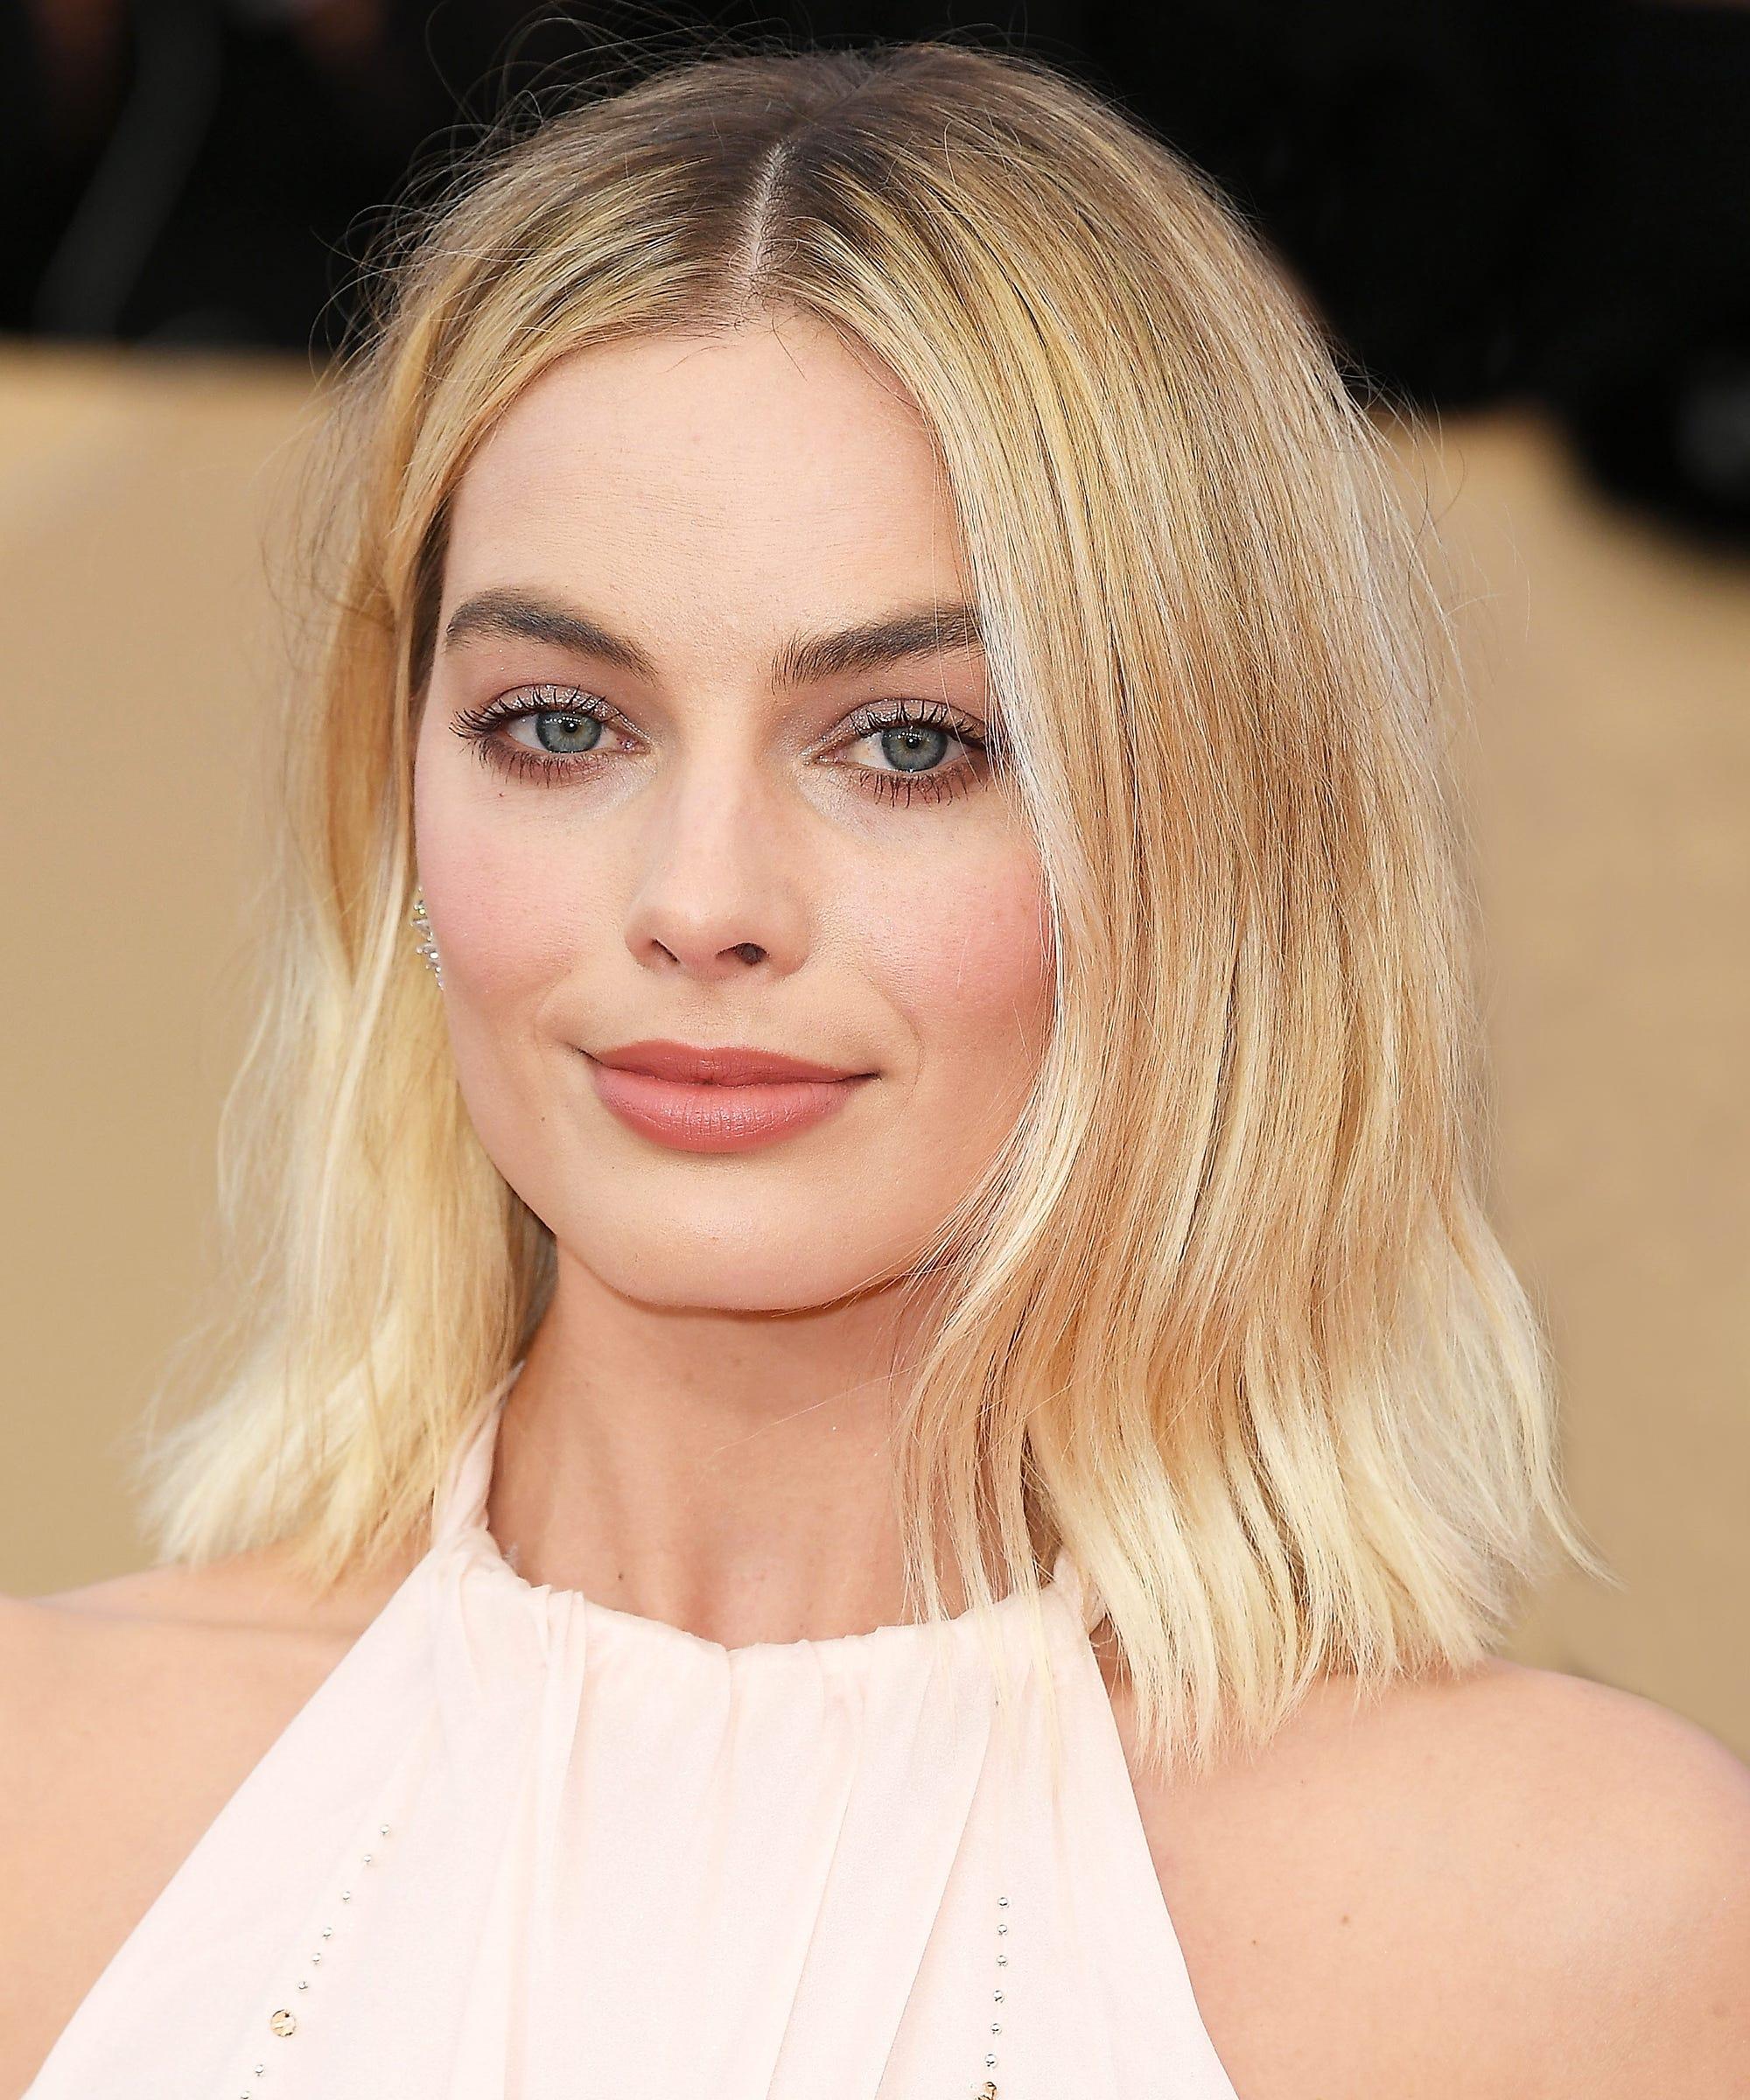 Charmful Why Margot Summer Hair Makeup Look So Good Margot Robbie Hair Color Formula Margot Robbie Hairstyle 2018 nice food Margot Robbie Hair